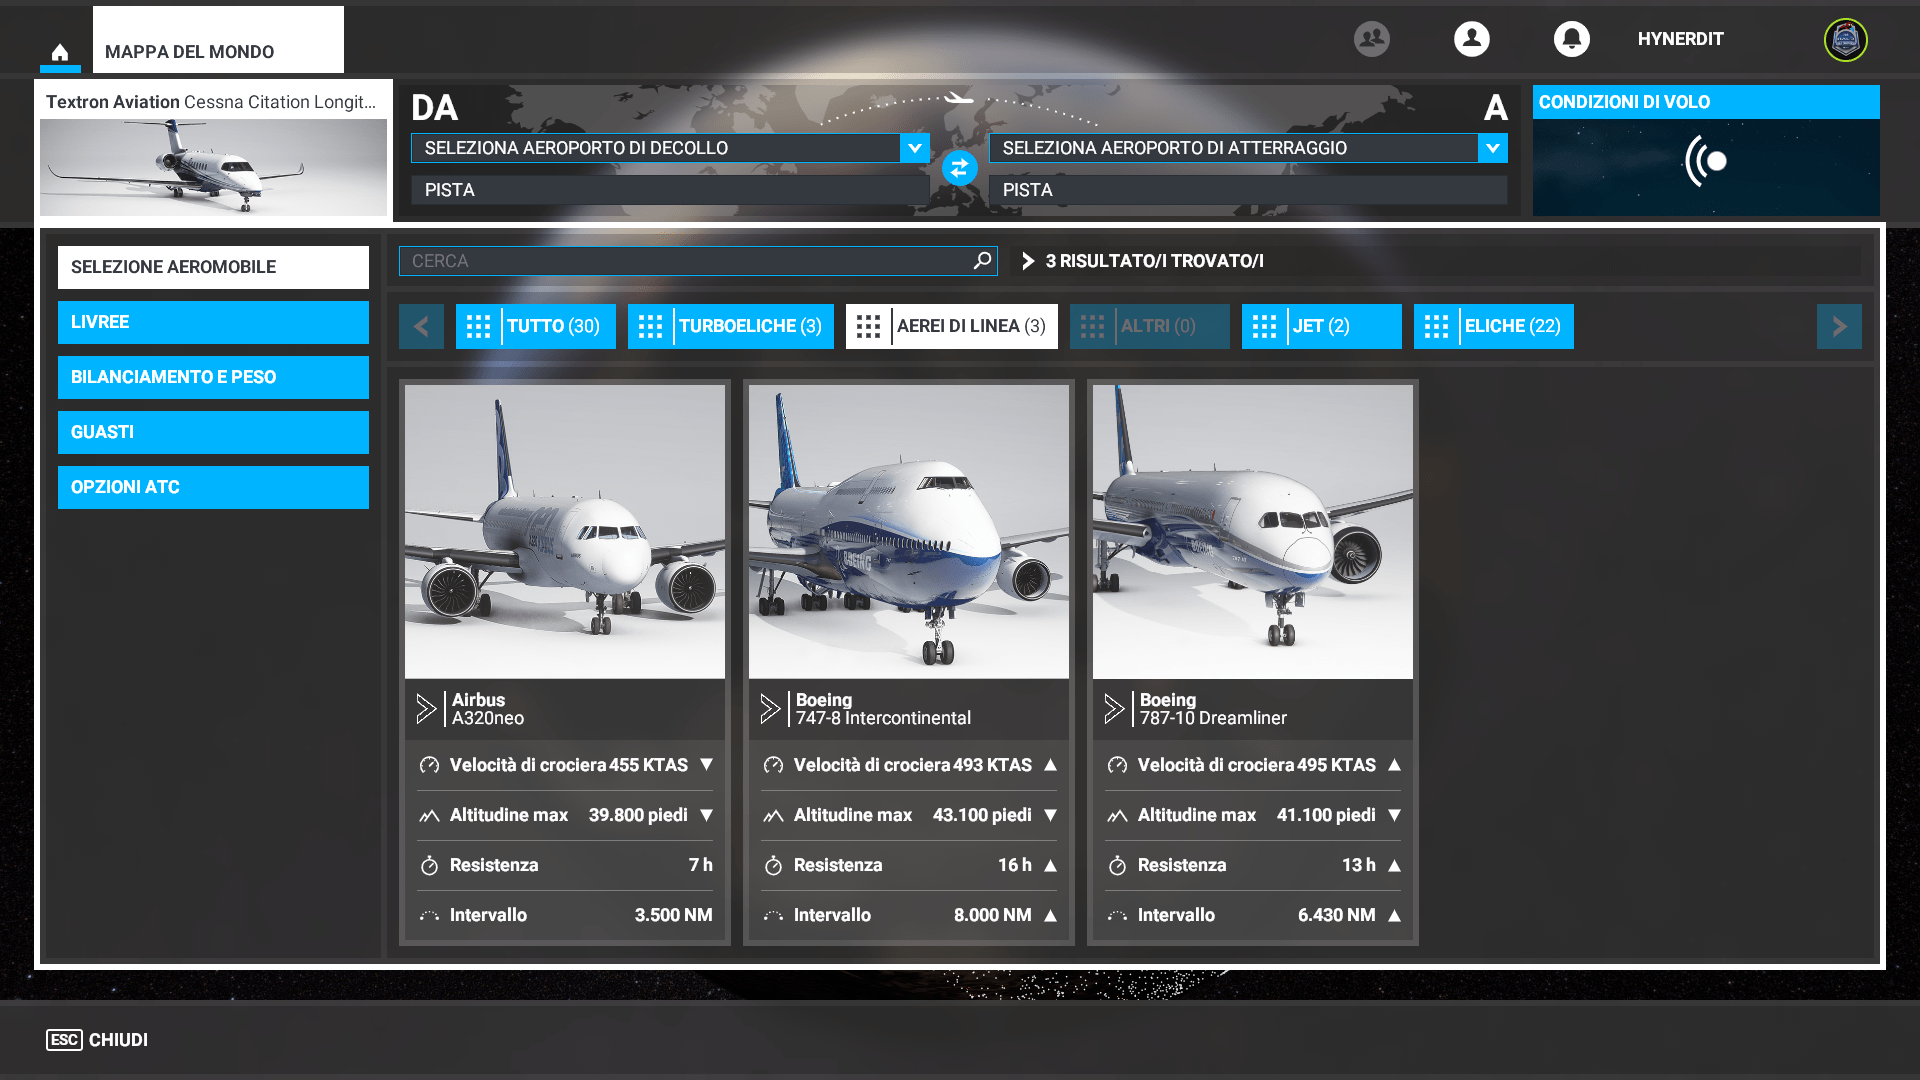 Microsoft Flight Simulator 2020: La Recensione 6 - Hynerd.it